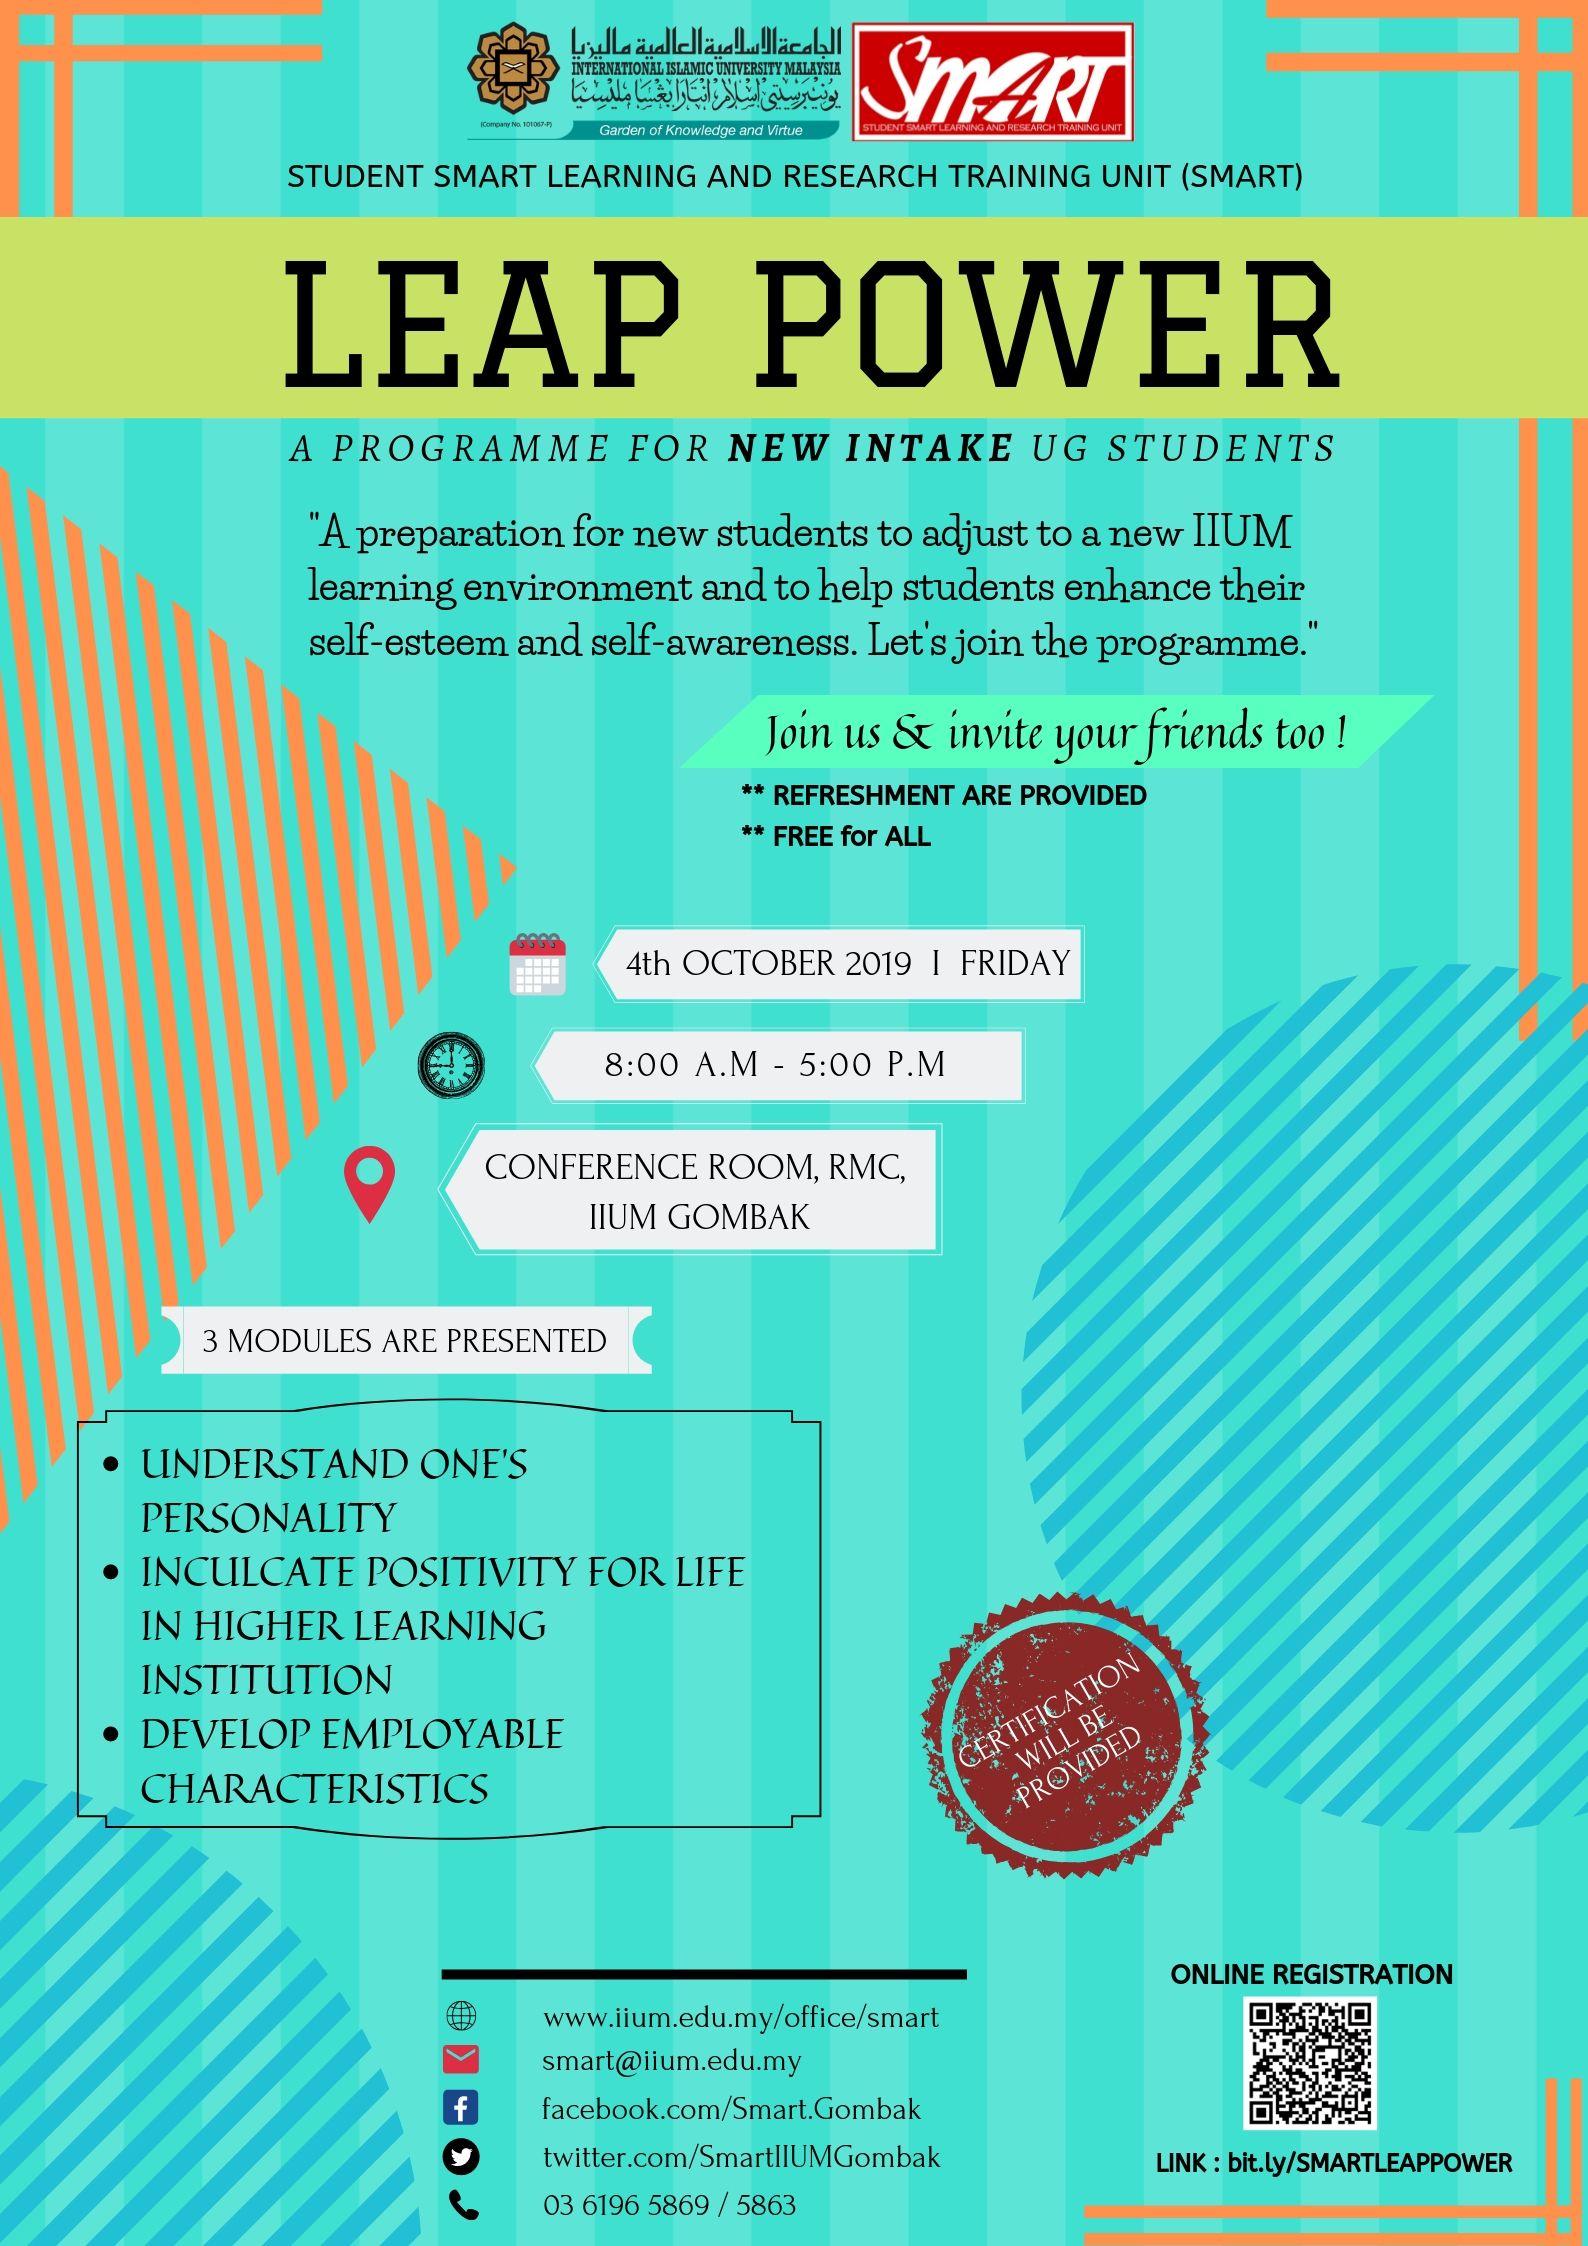 LEAP POWER FOR UG INTAKE, SEM 1, 2019/2020